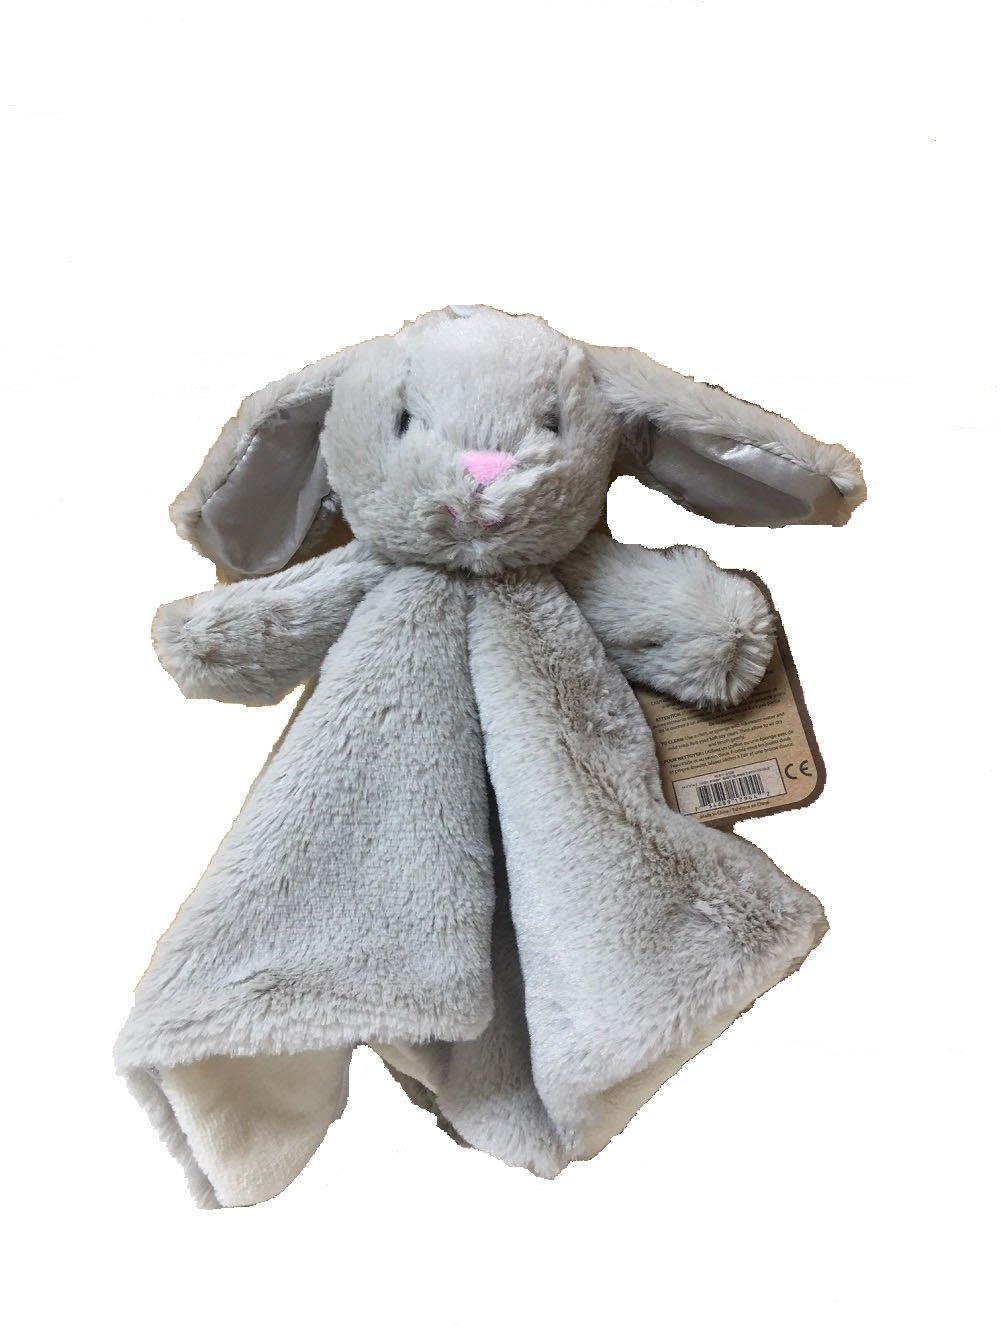 Kellytoy Baby Bunny Rabbit Security Plush Blanket With Lovey Rattle Grey